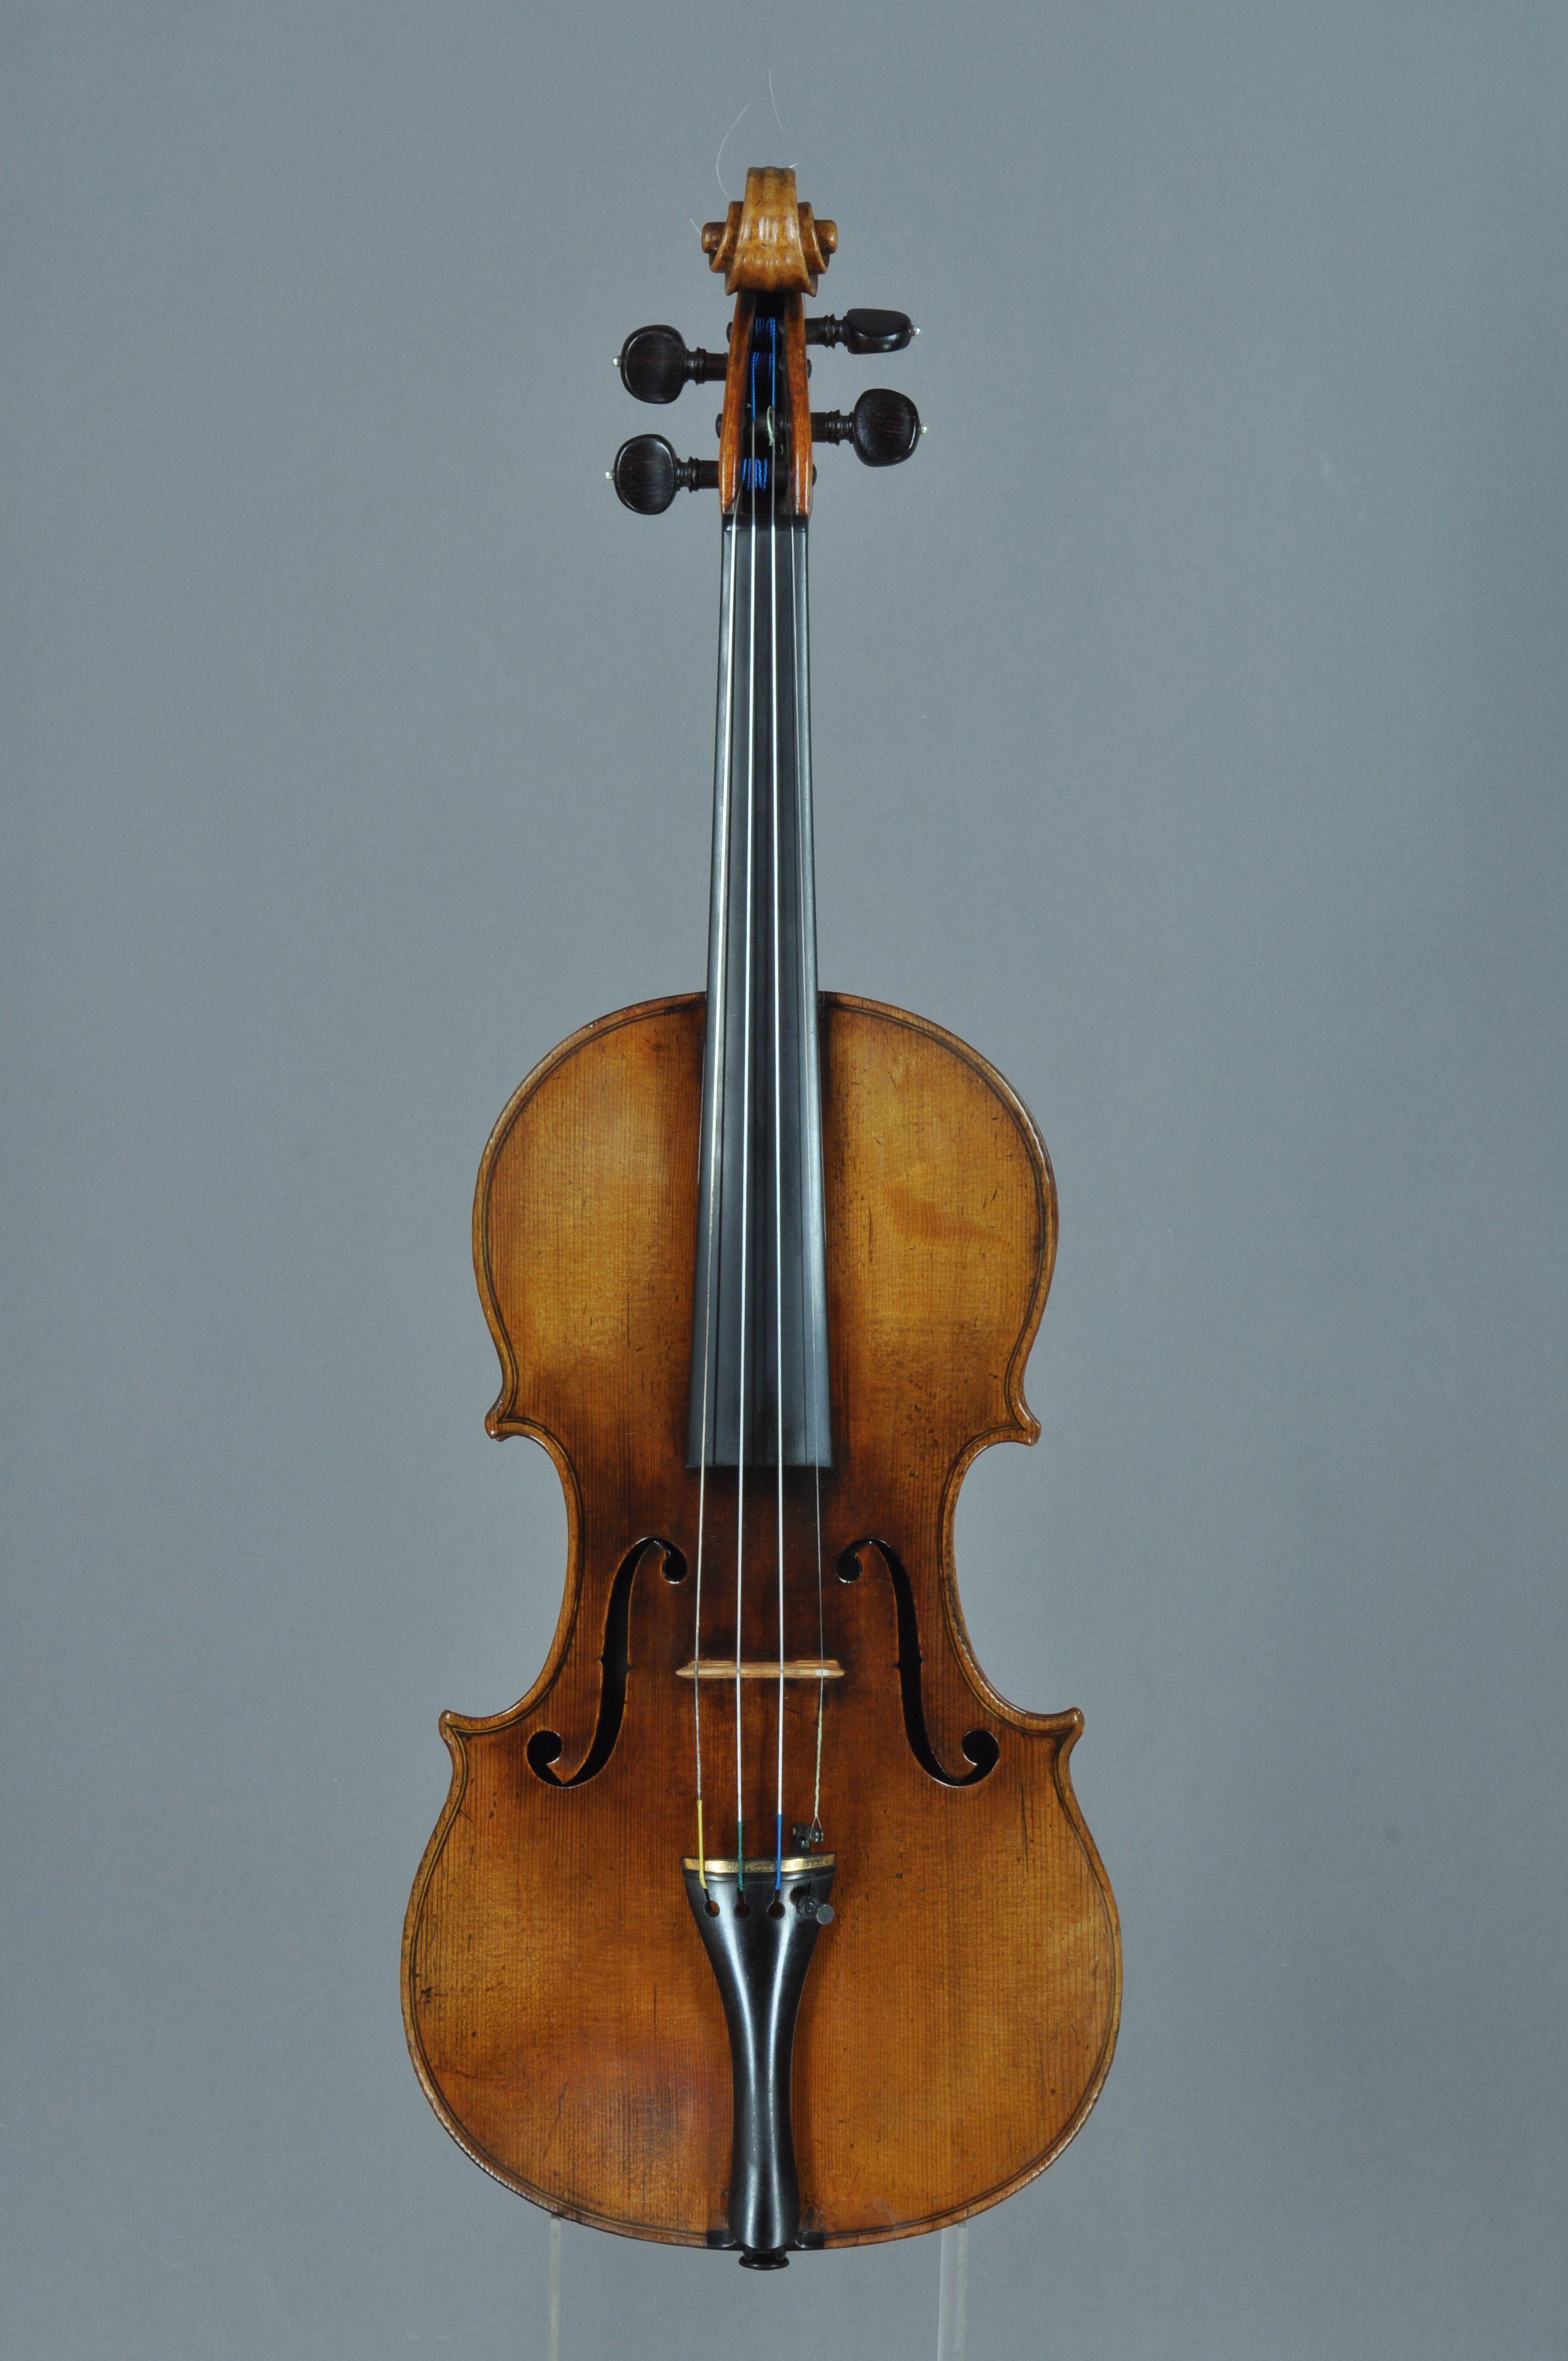 Costa-Geige